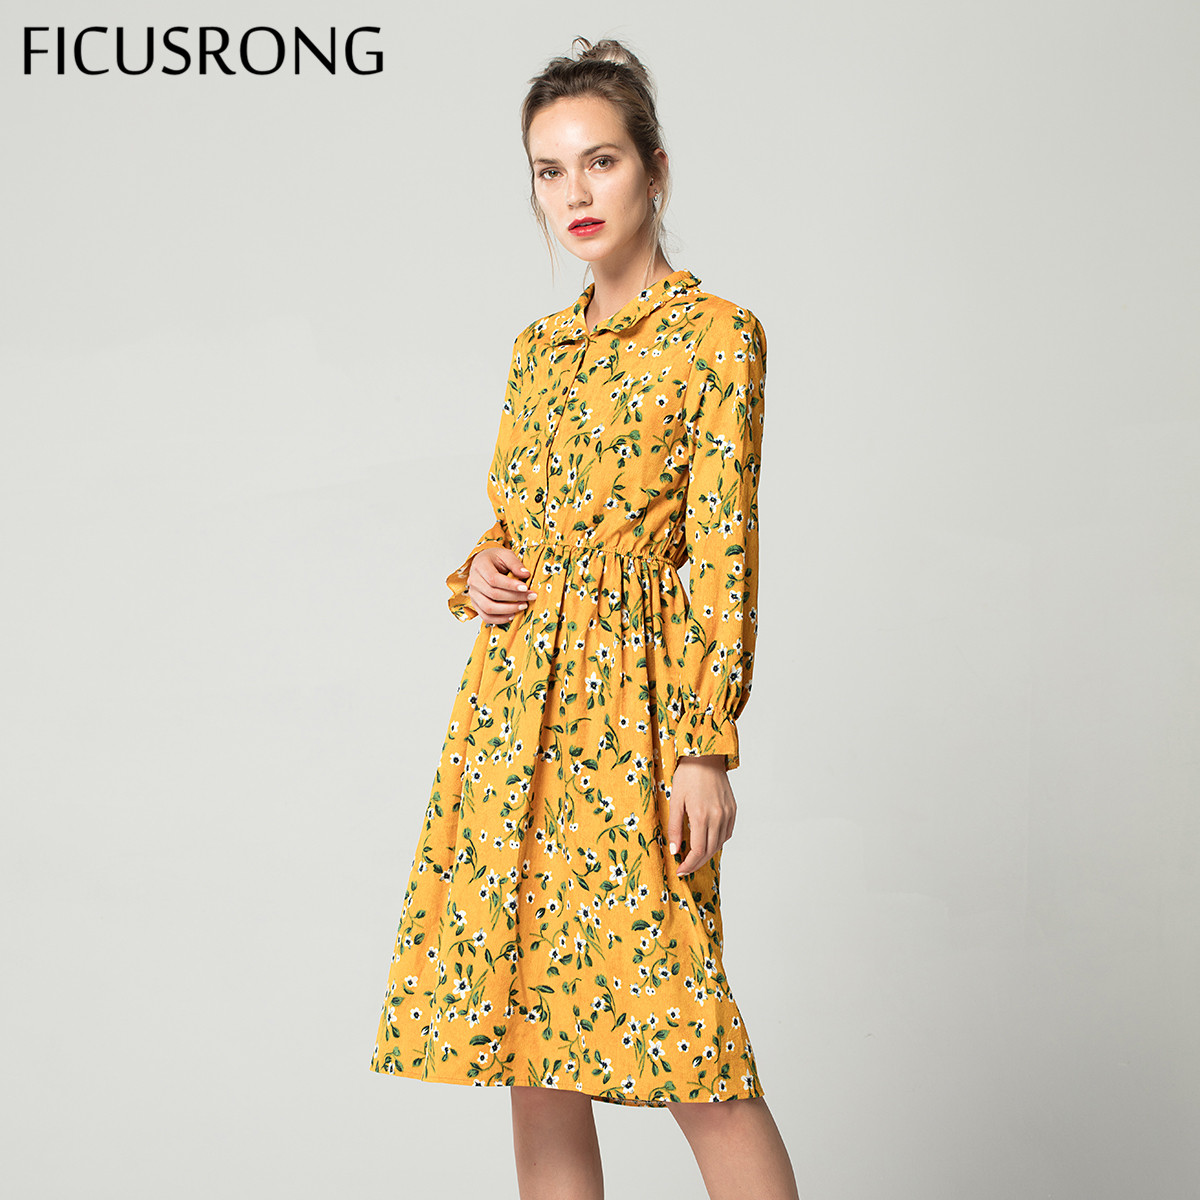 Corduroy High Elastic Waist Vintage Dress A-line Style Women Full Sleeve Flower Plaid Print Dresses Slim Feminino FICUSRONG